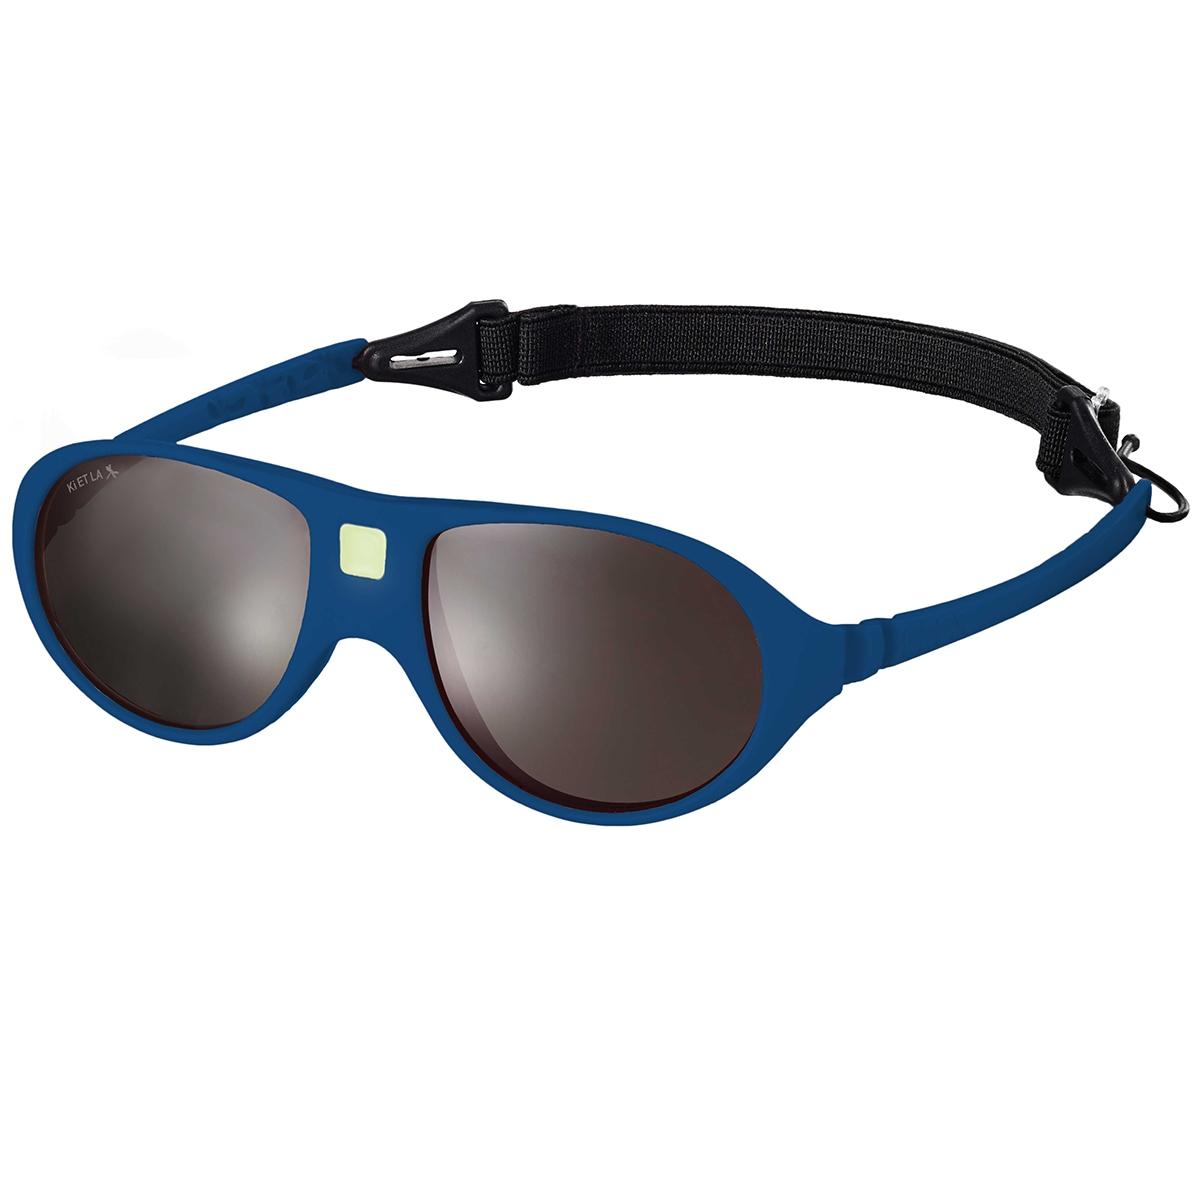 Mycey Mass Local Children's Sunglasses Age 2-4 Royal Blue